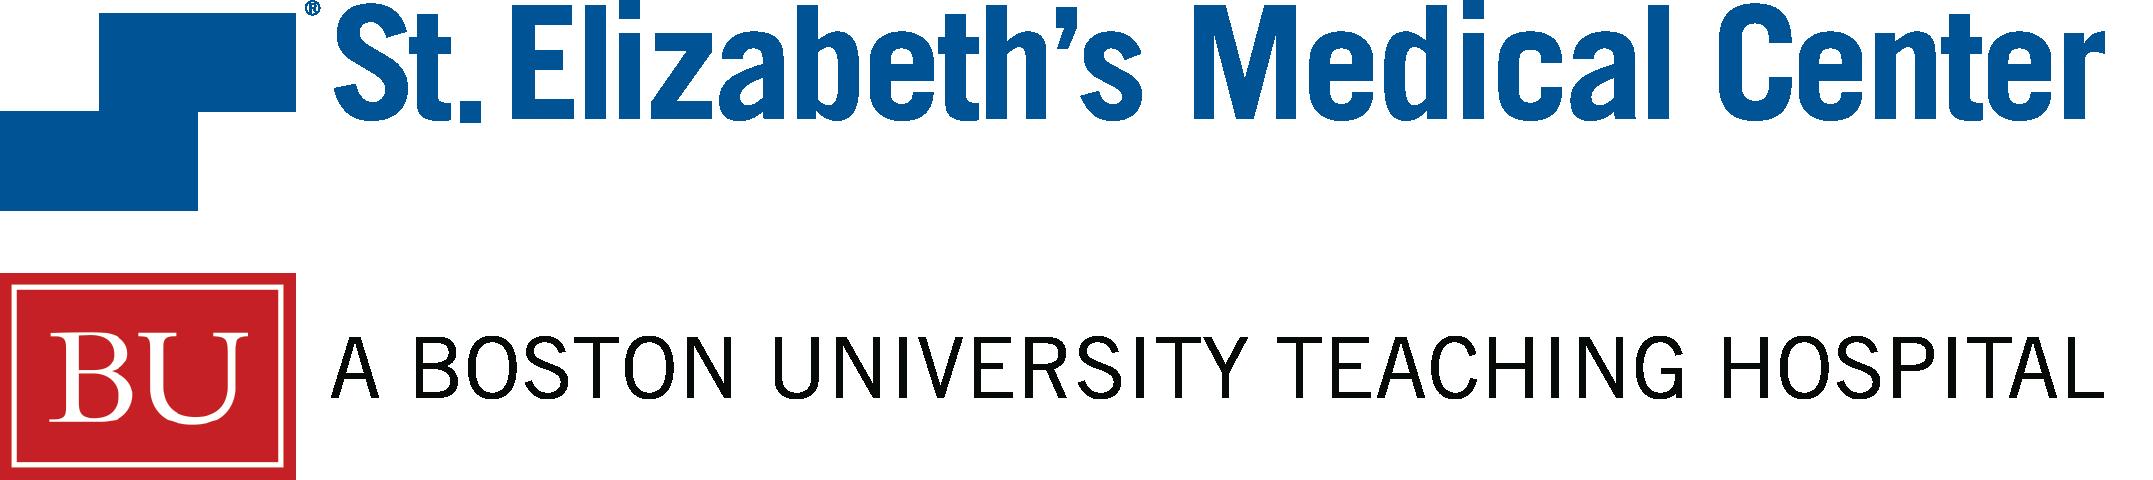 St. Elizabeth's Medical Center A Boston University Teaching Hospital logo